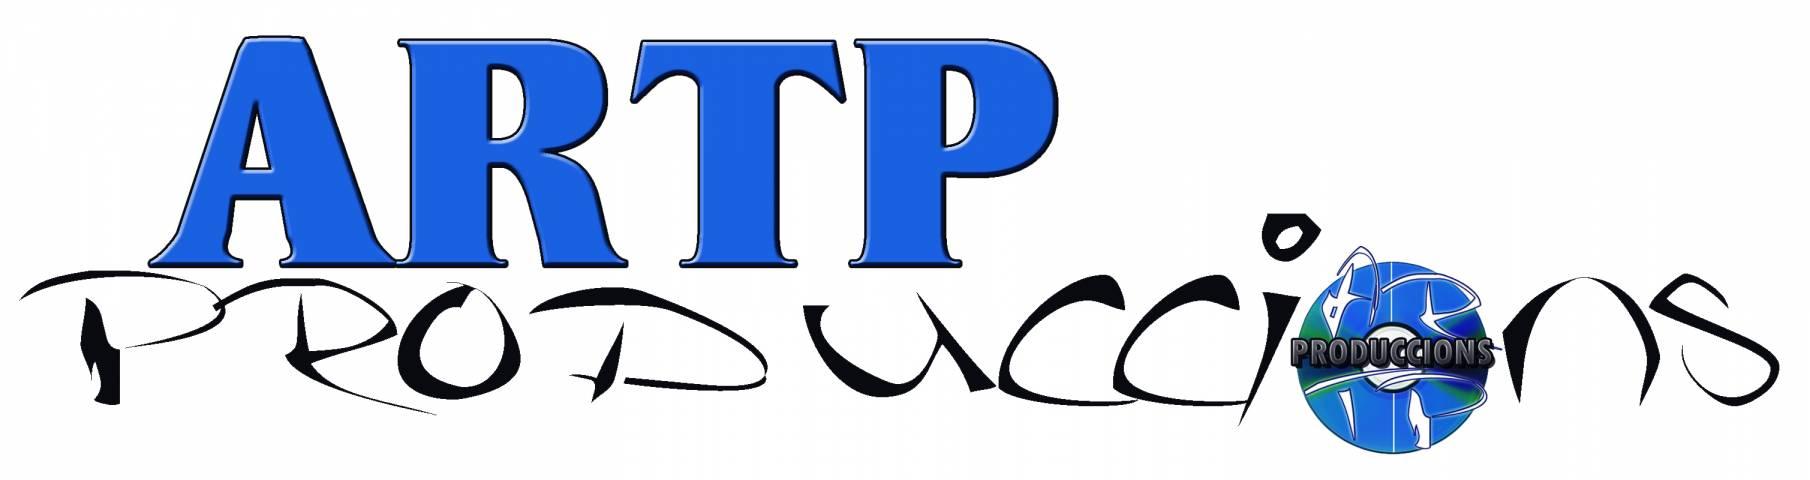 ARTP Produccions